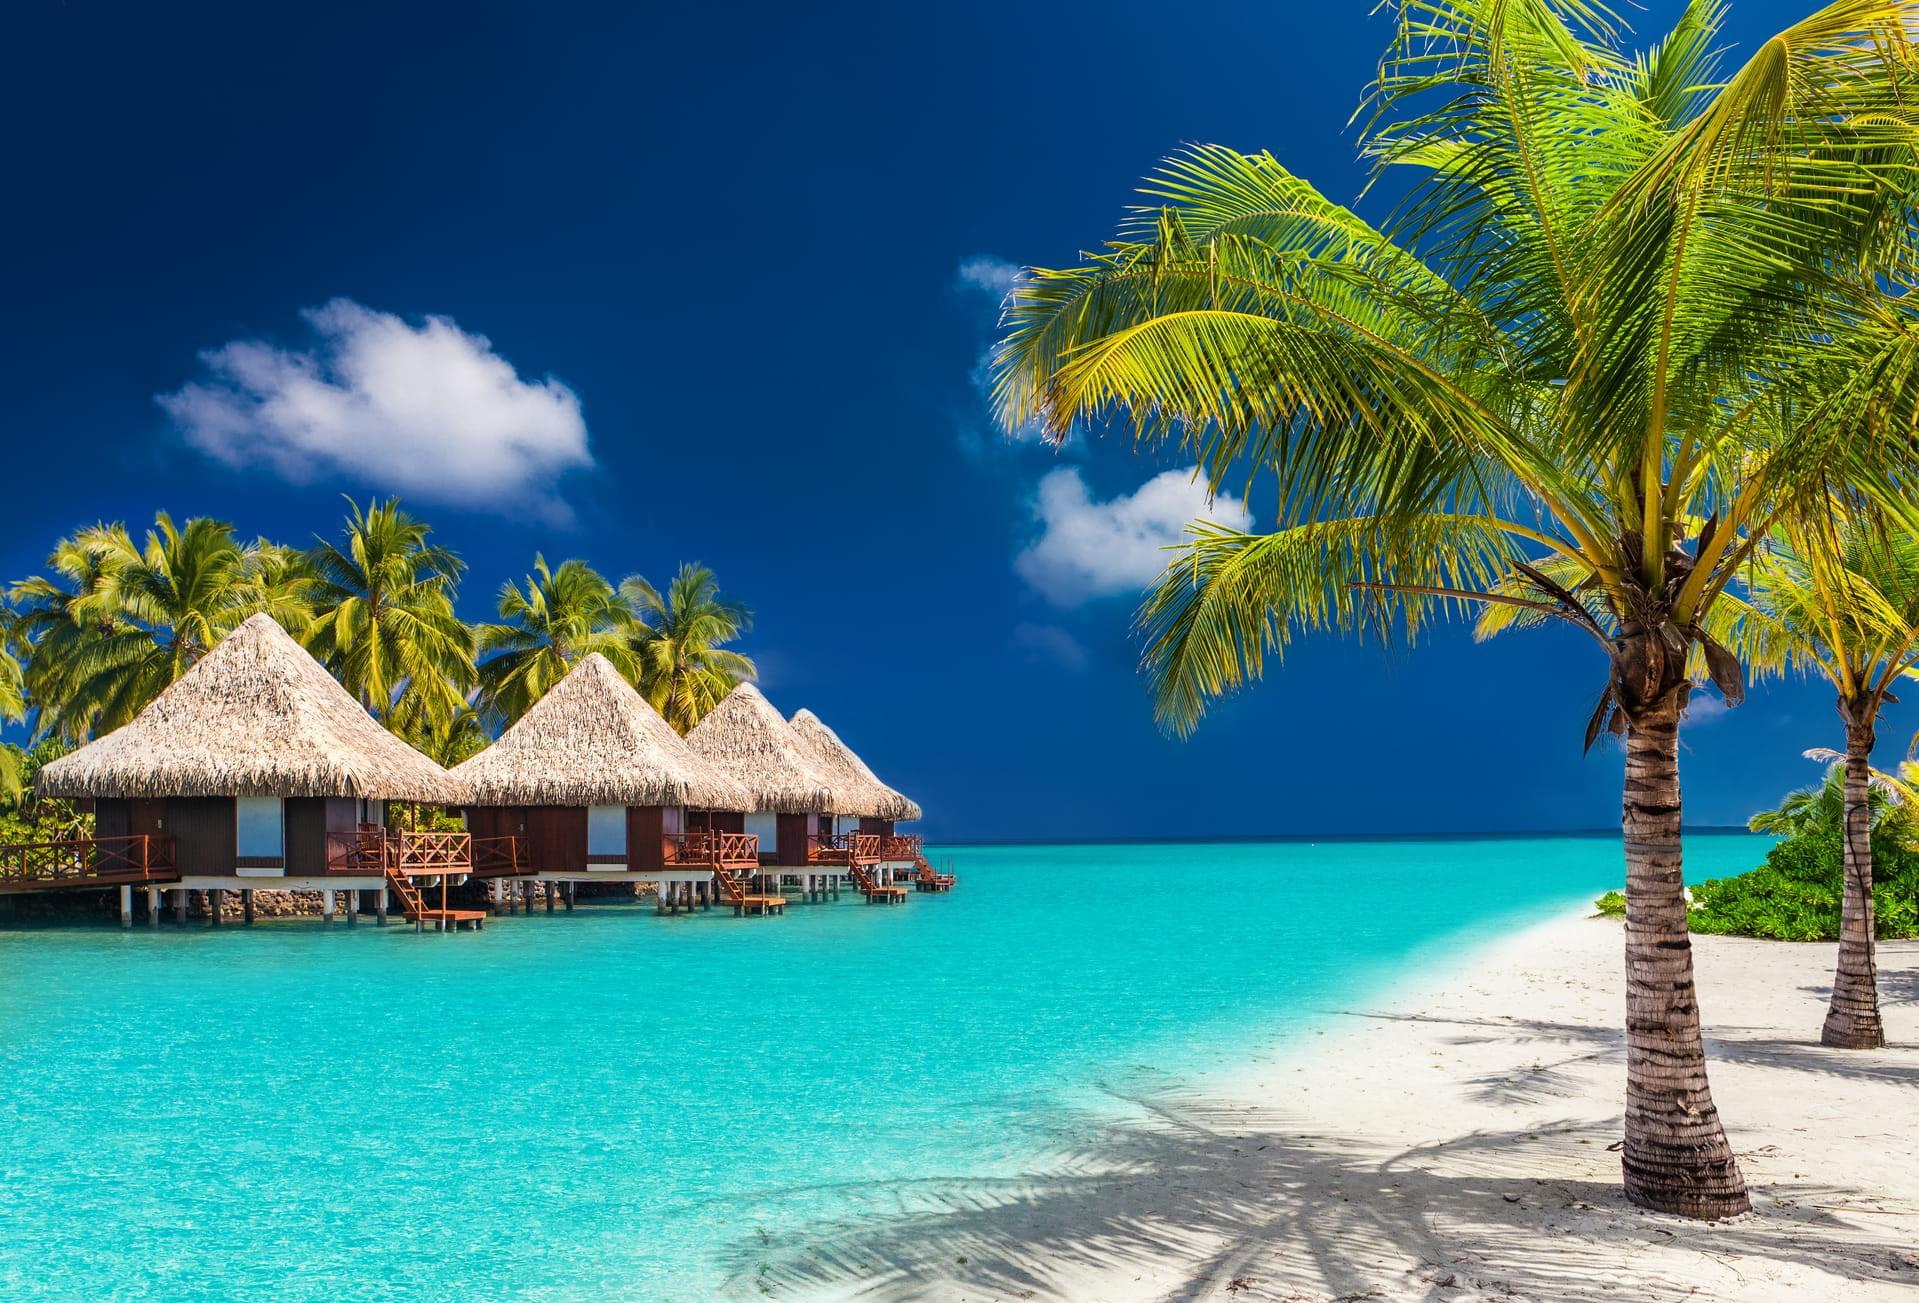 padi travel | scuba diving vacations